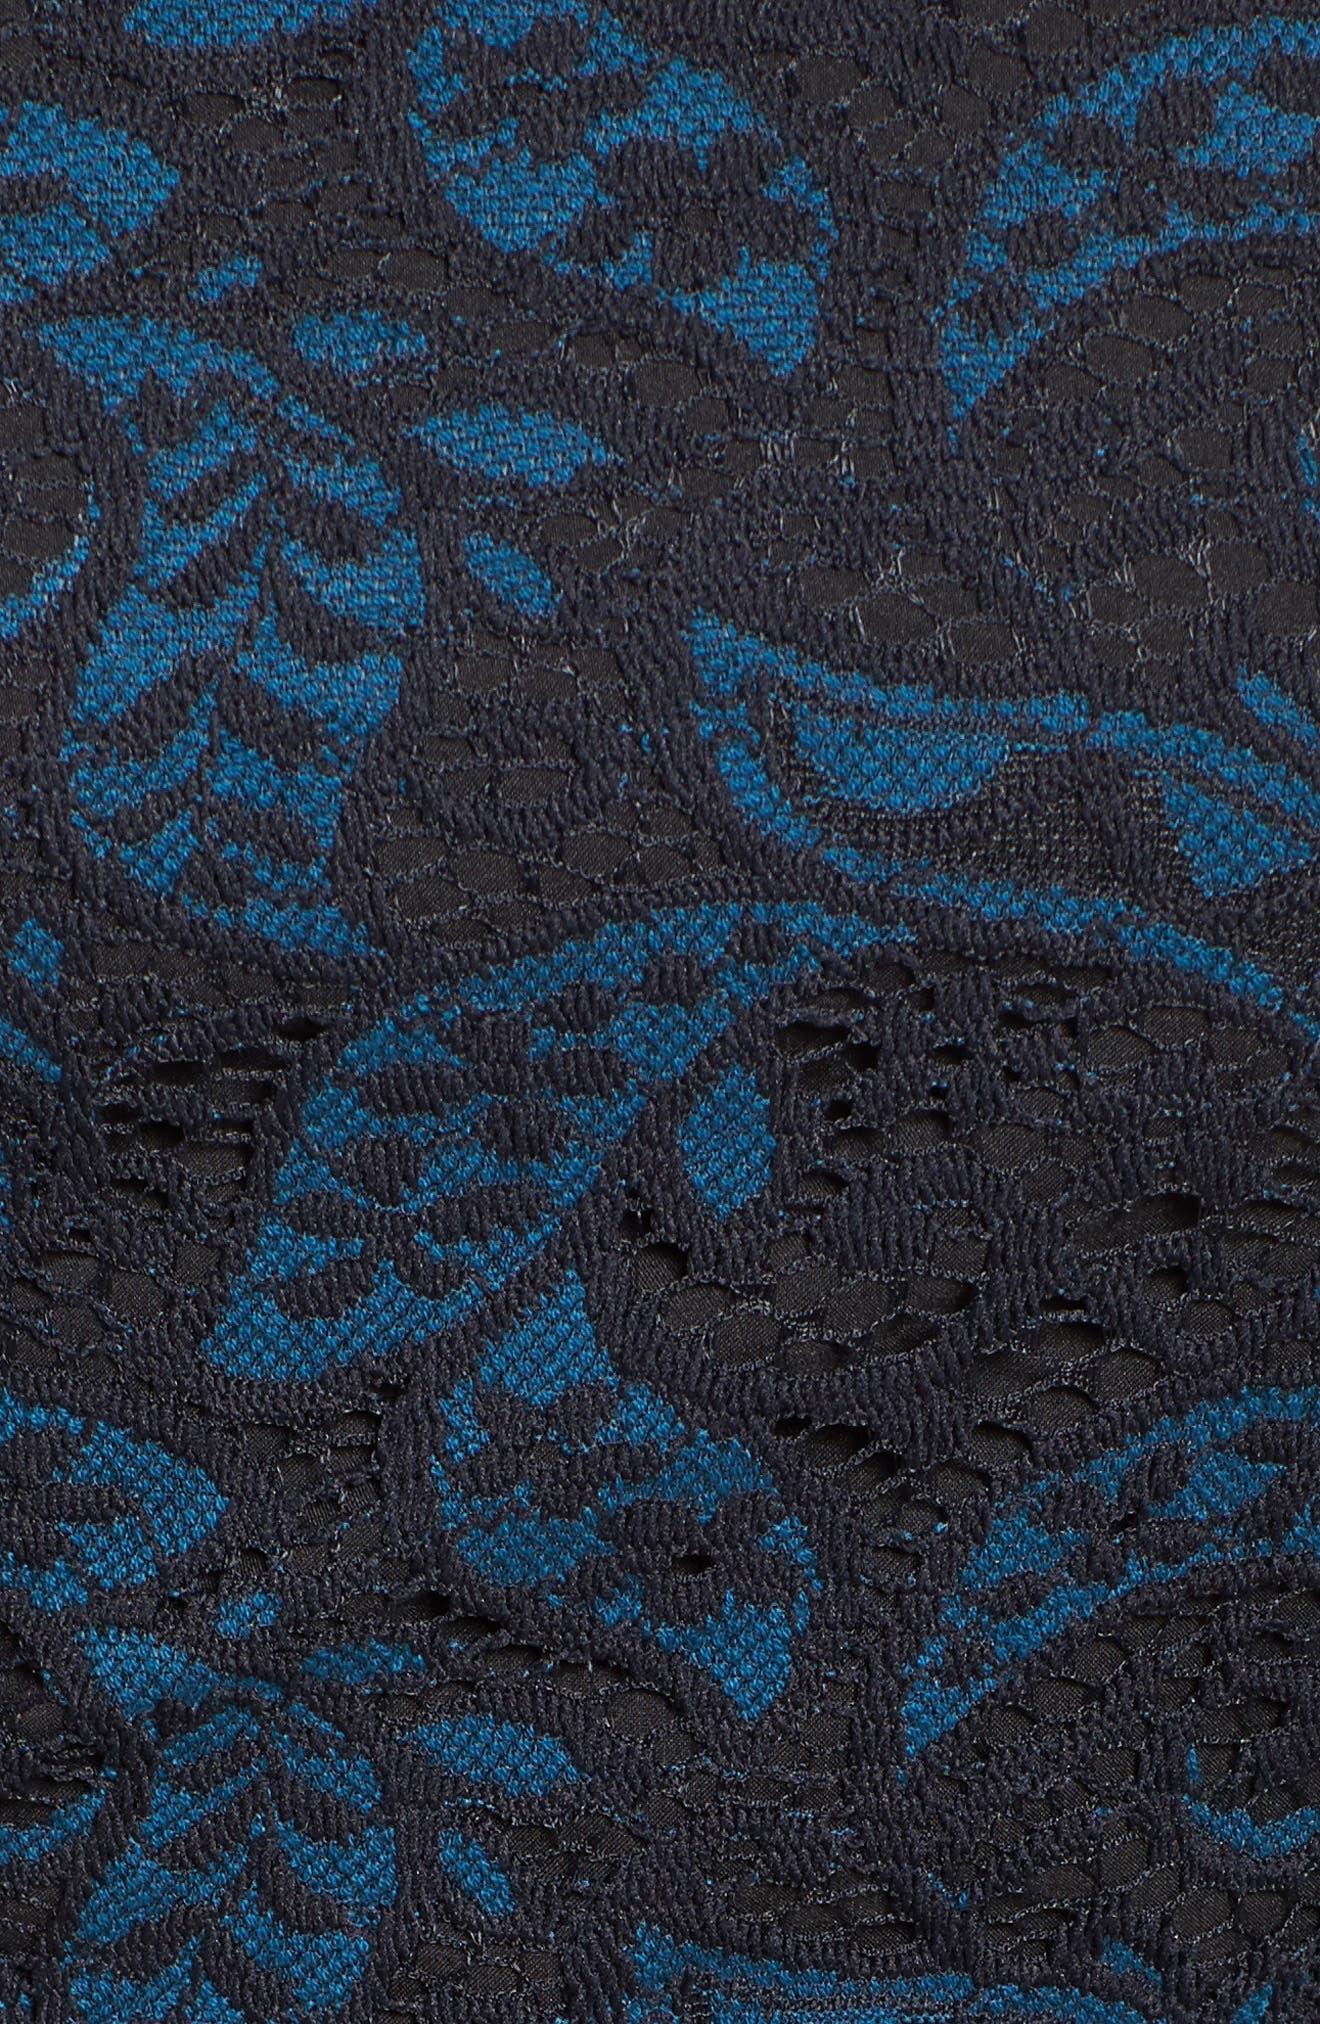 Lace Bishop Sleeve Dress,                             Alternate thumbnail 5, color,                             Blue/ Black